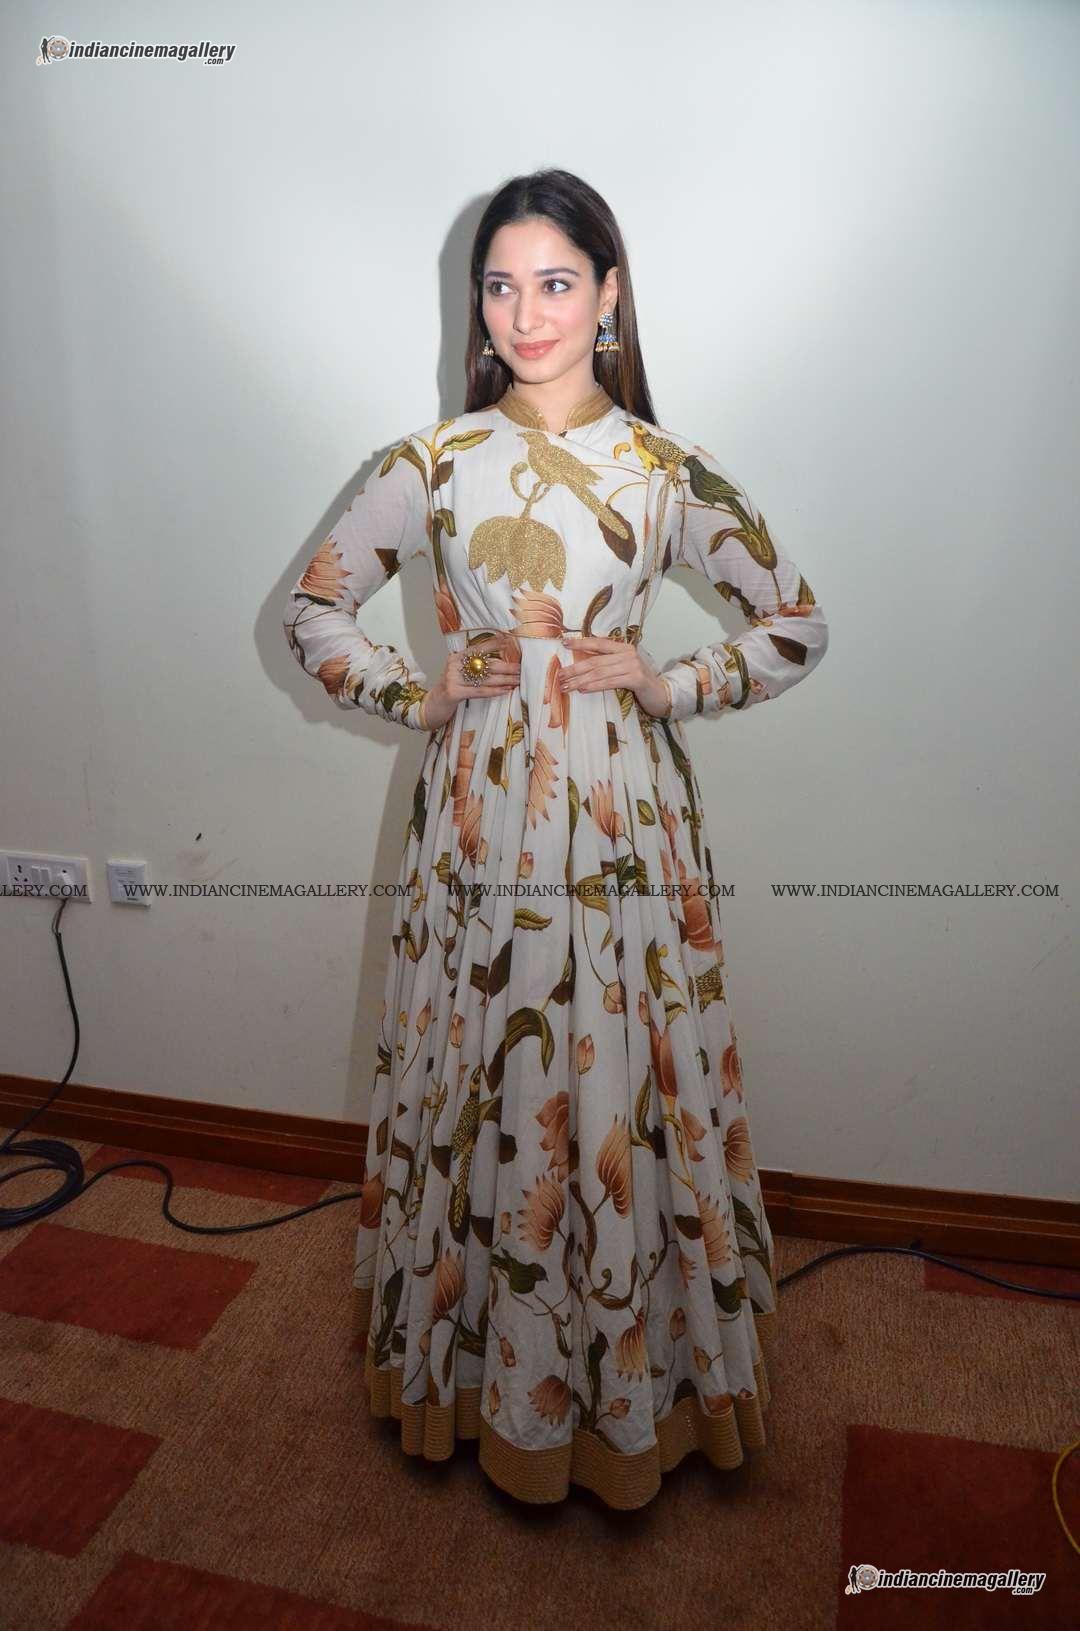 tamanna-bhatia-at-bahubali-tamil-press-meet-(8) | indian cinema in